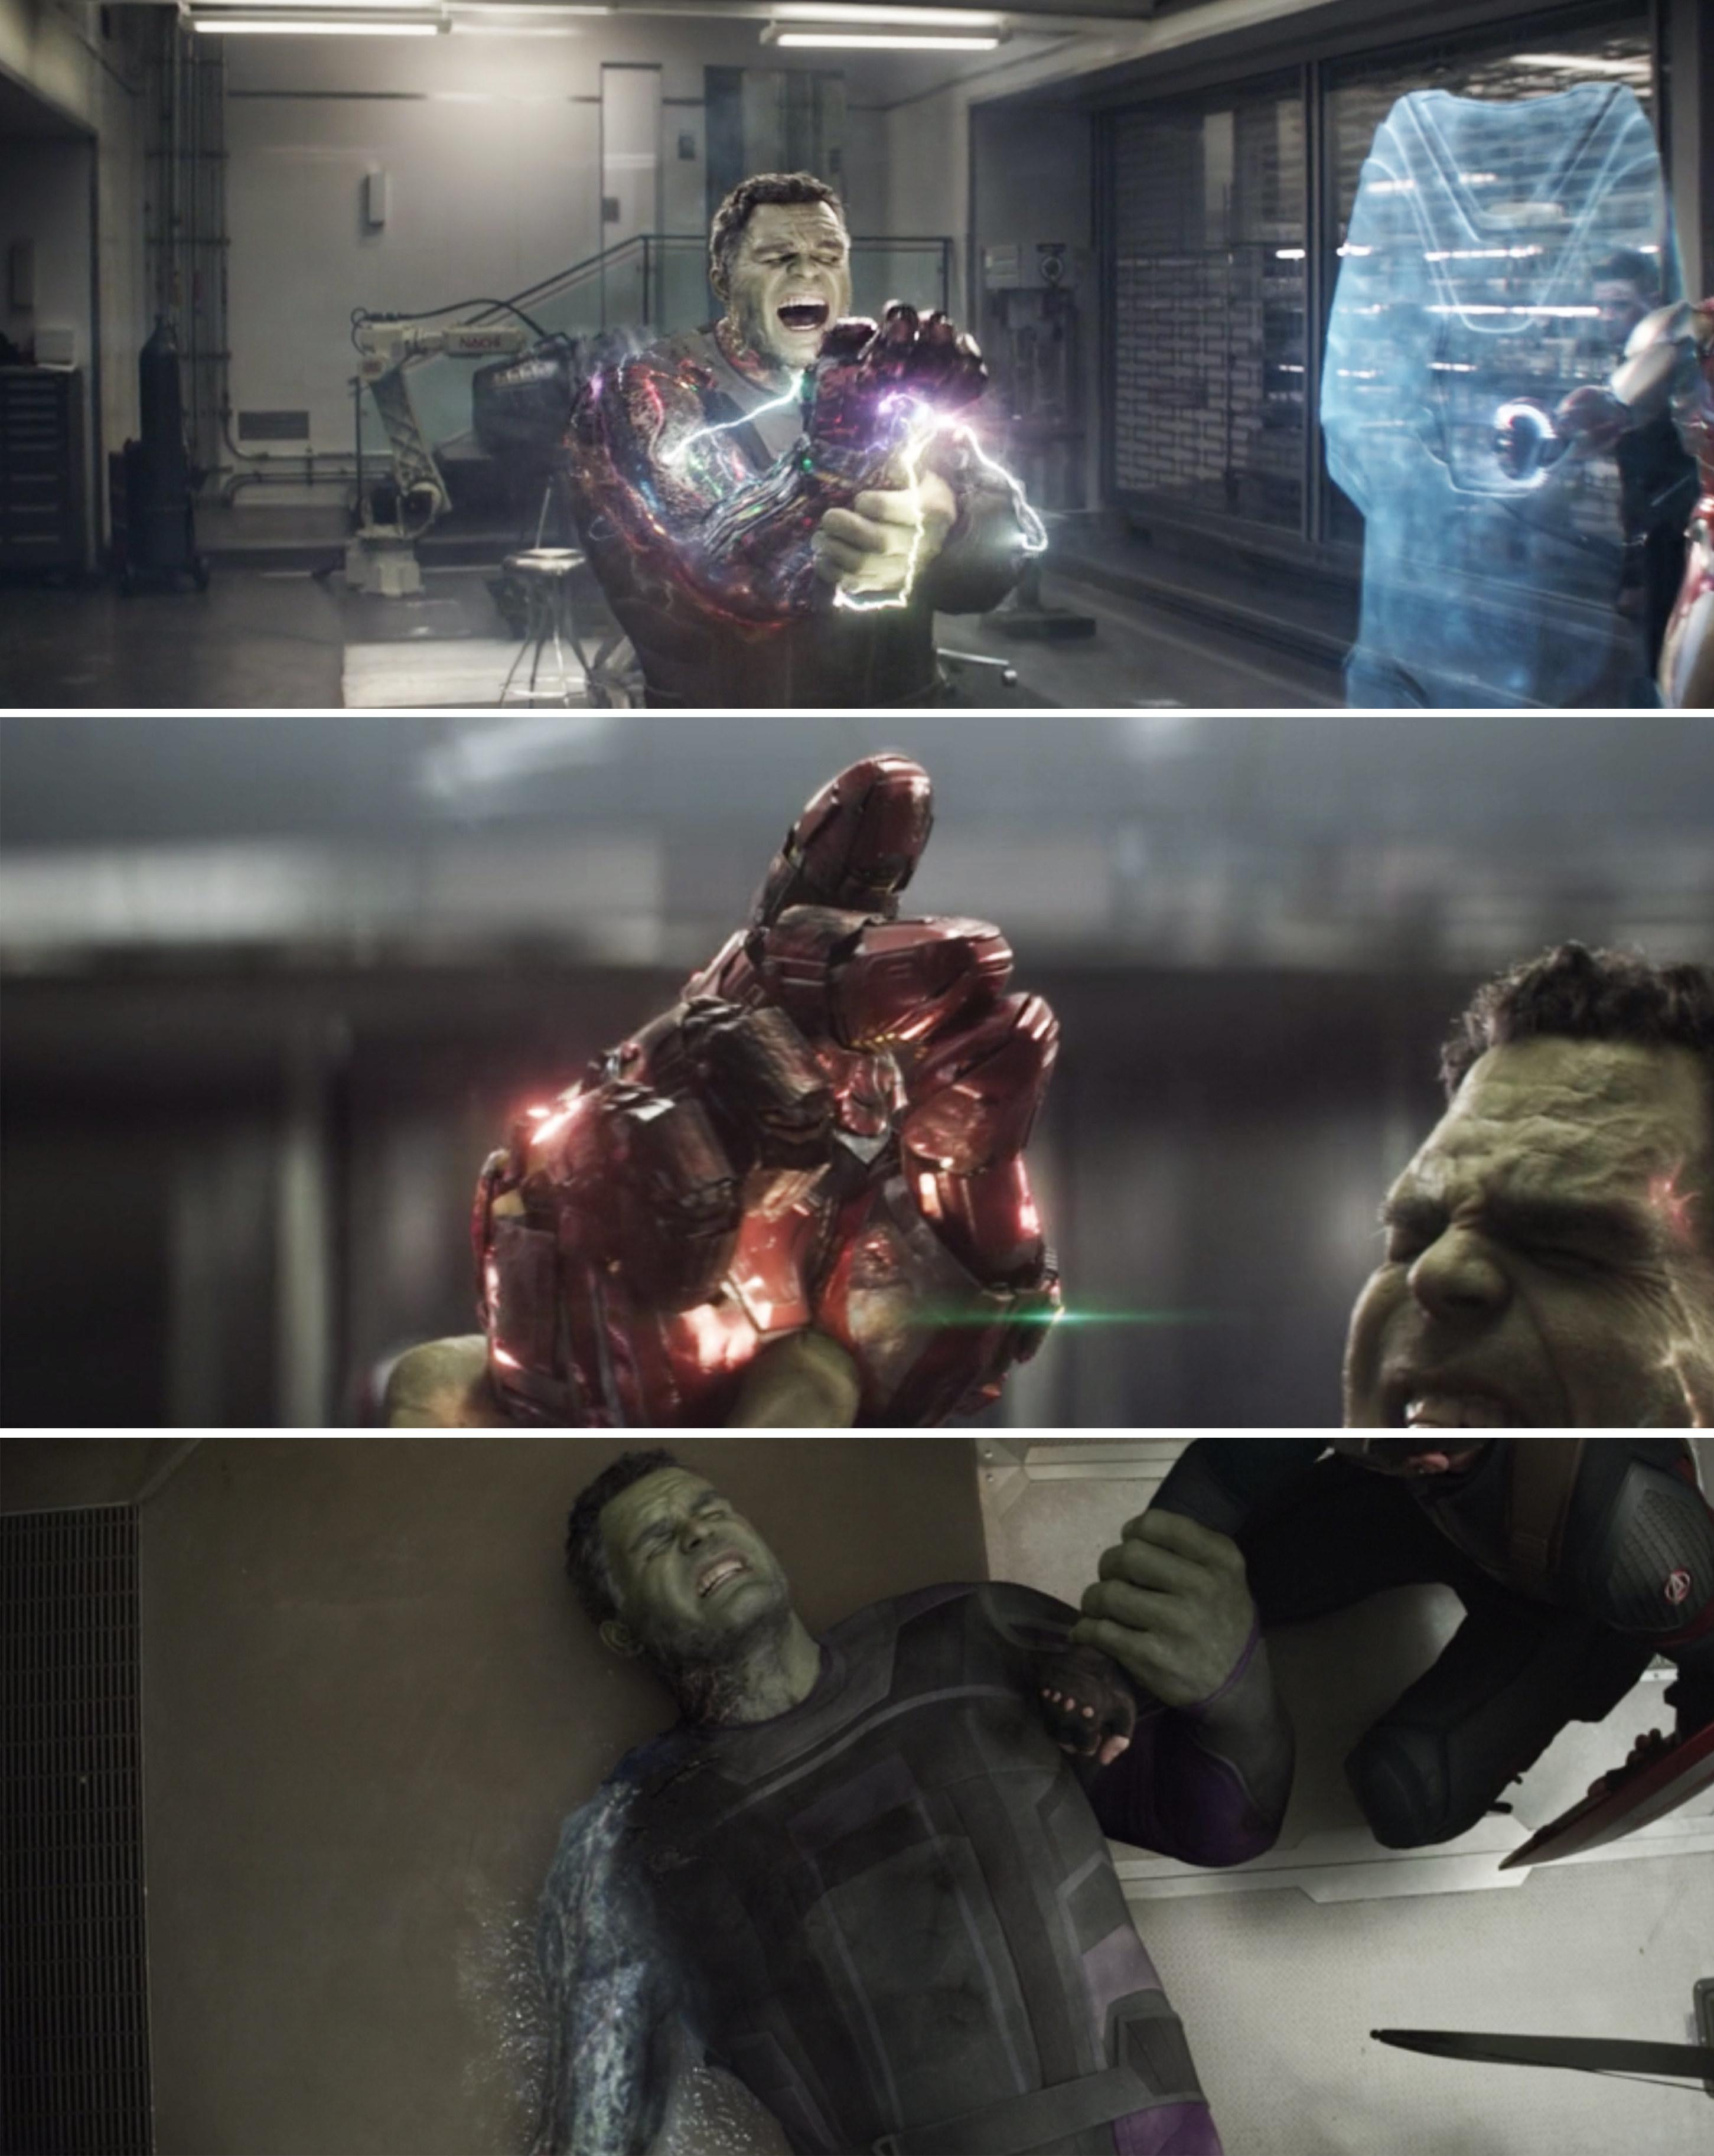 Hulk wielding the Infinity Gauntlet